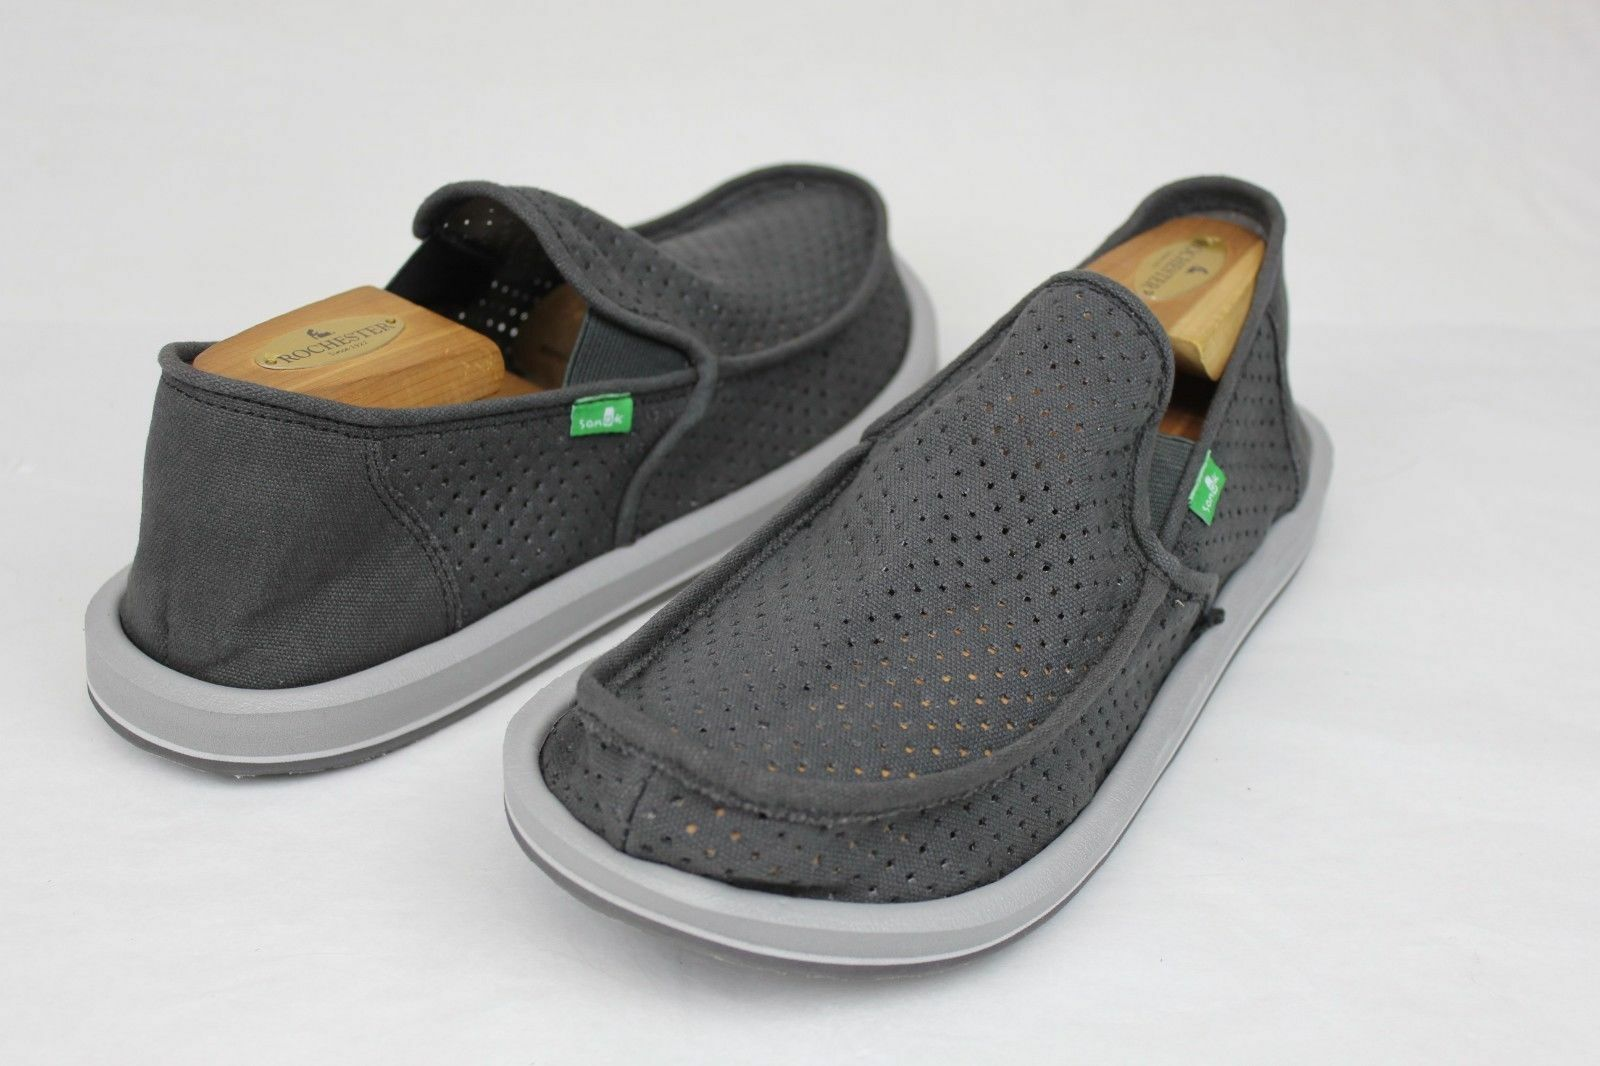 Sanuk Vagabond Perf Sidewalk Surfer Sandal shoes Men's New Retail